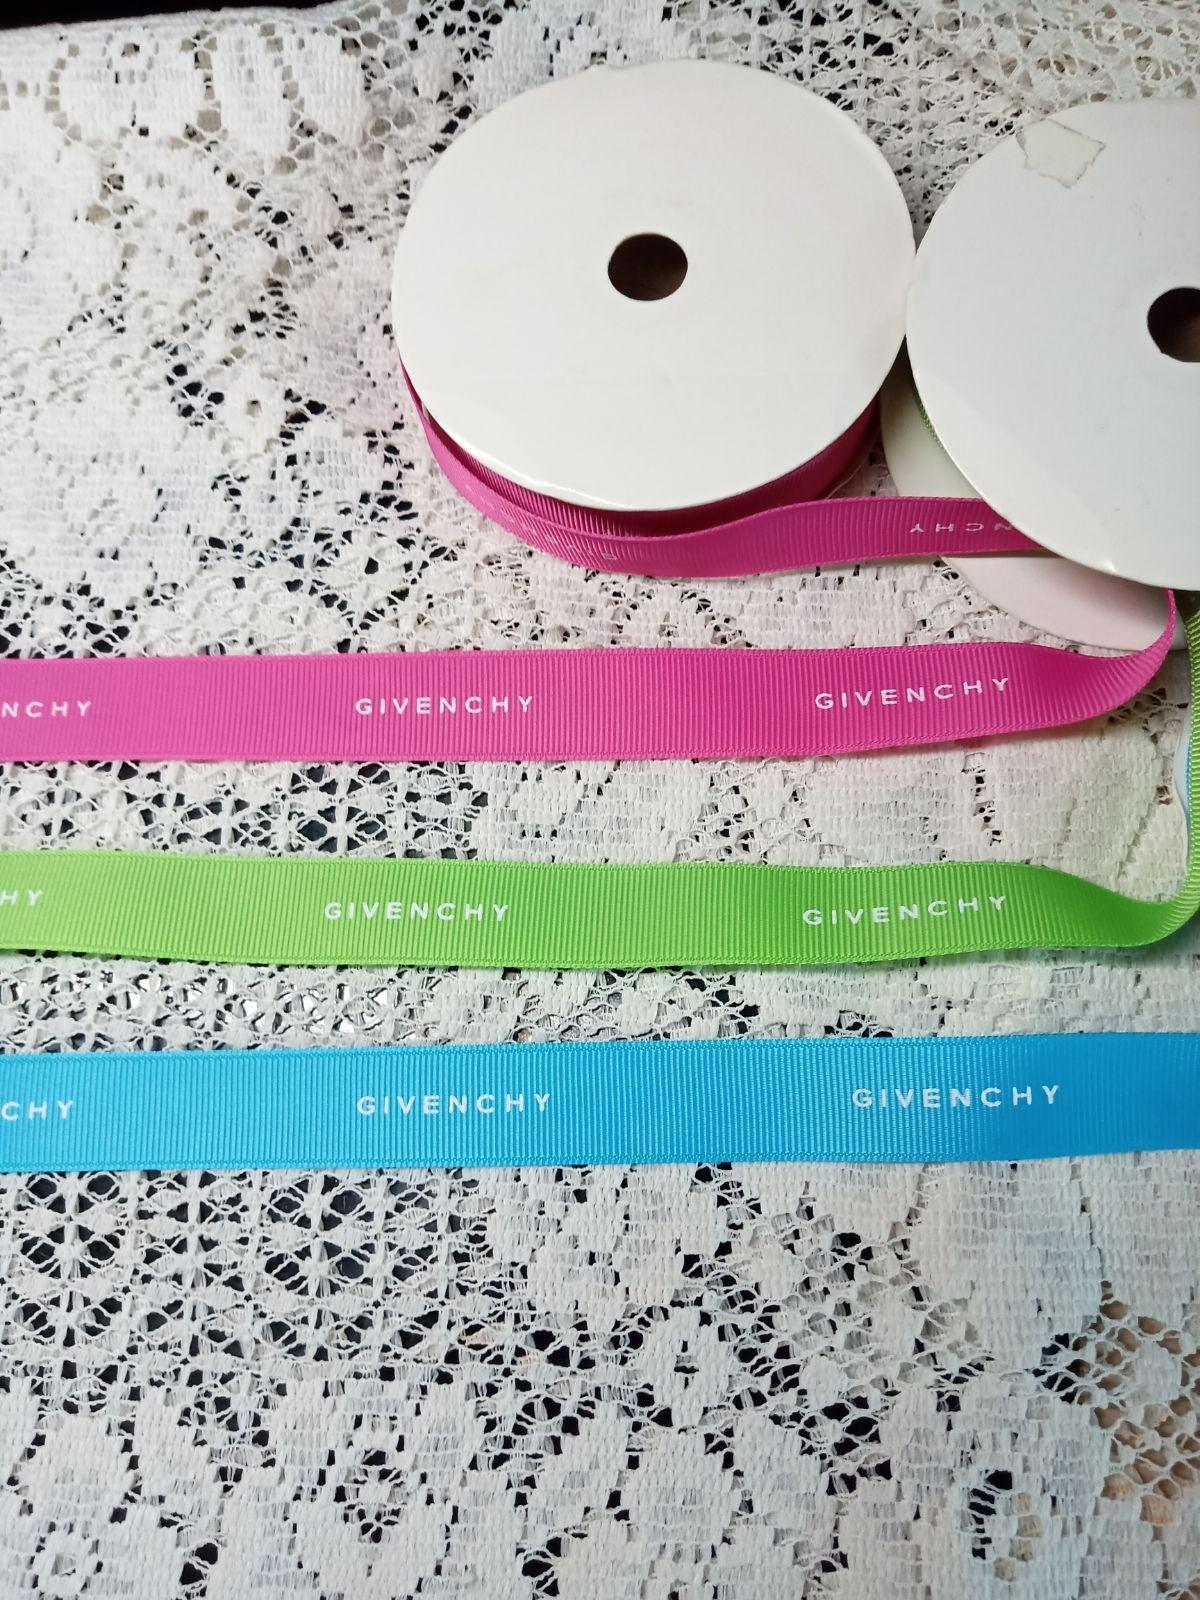 100% Authentic Givenchy Ribbon 1 Yard